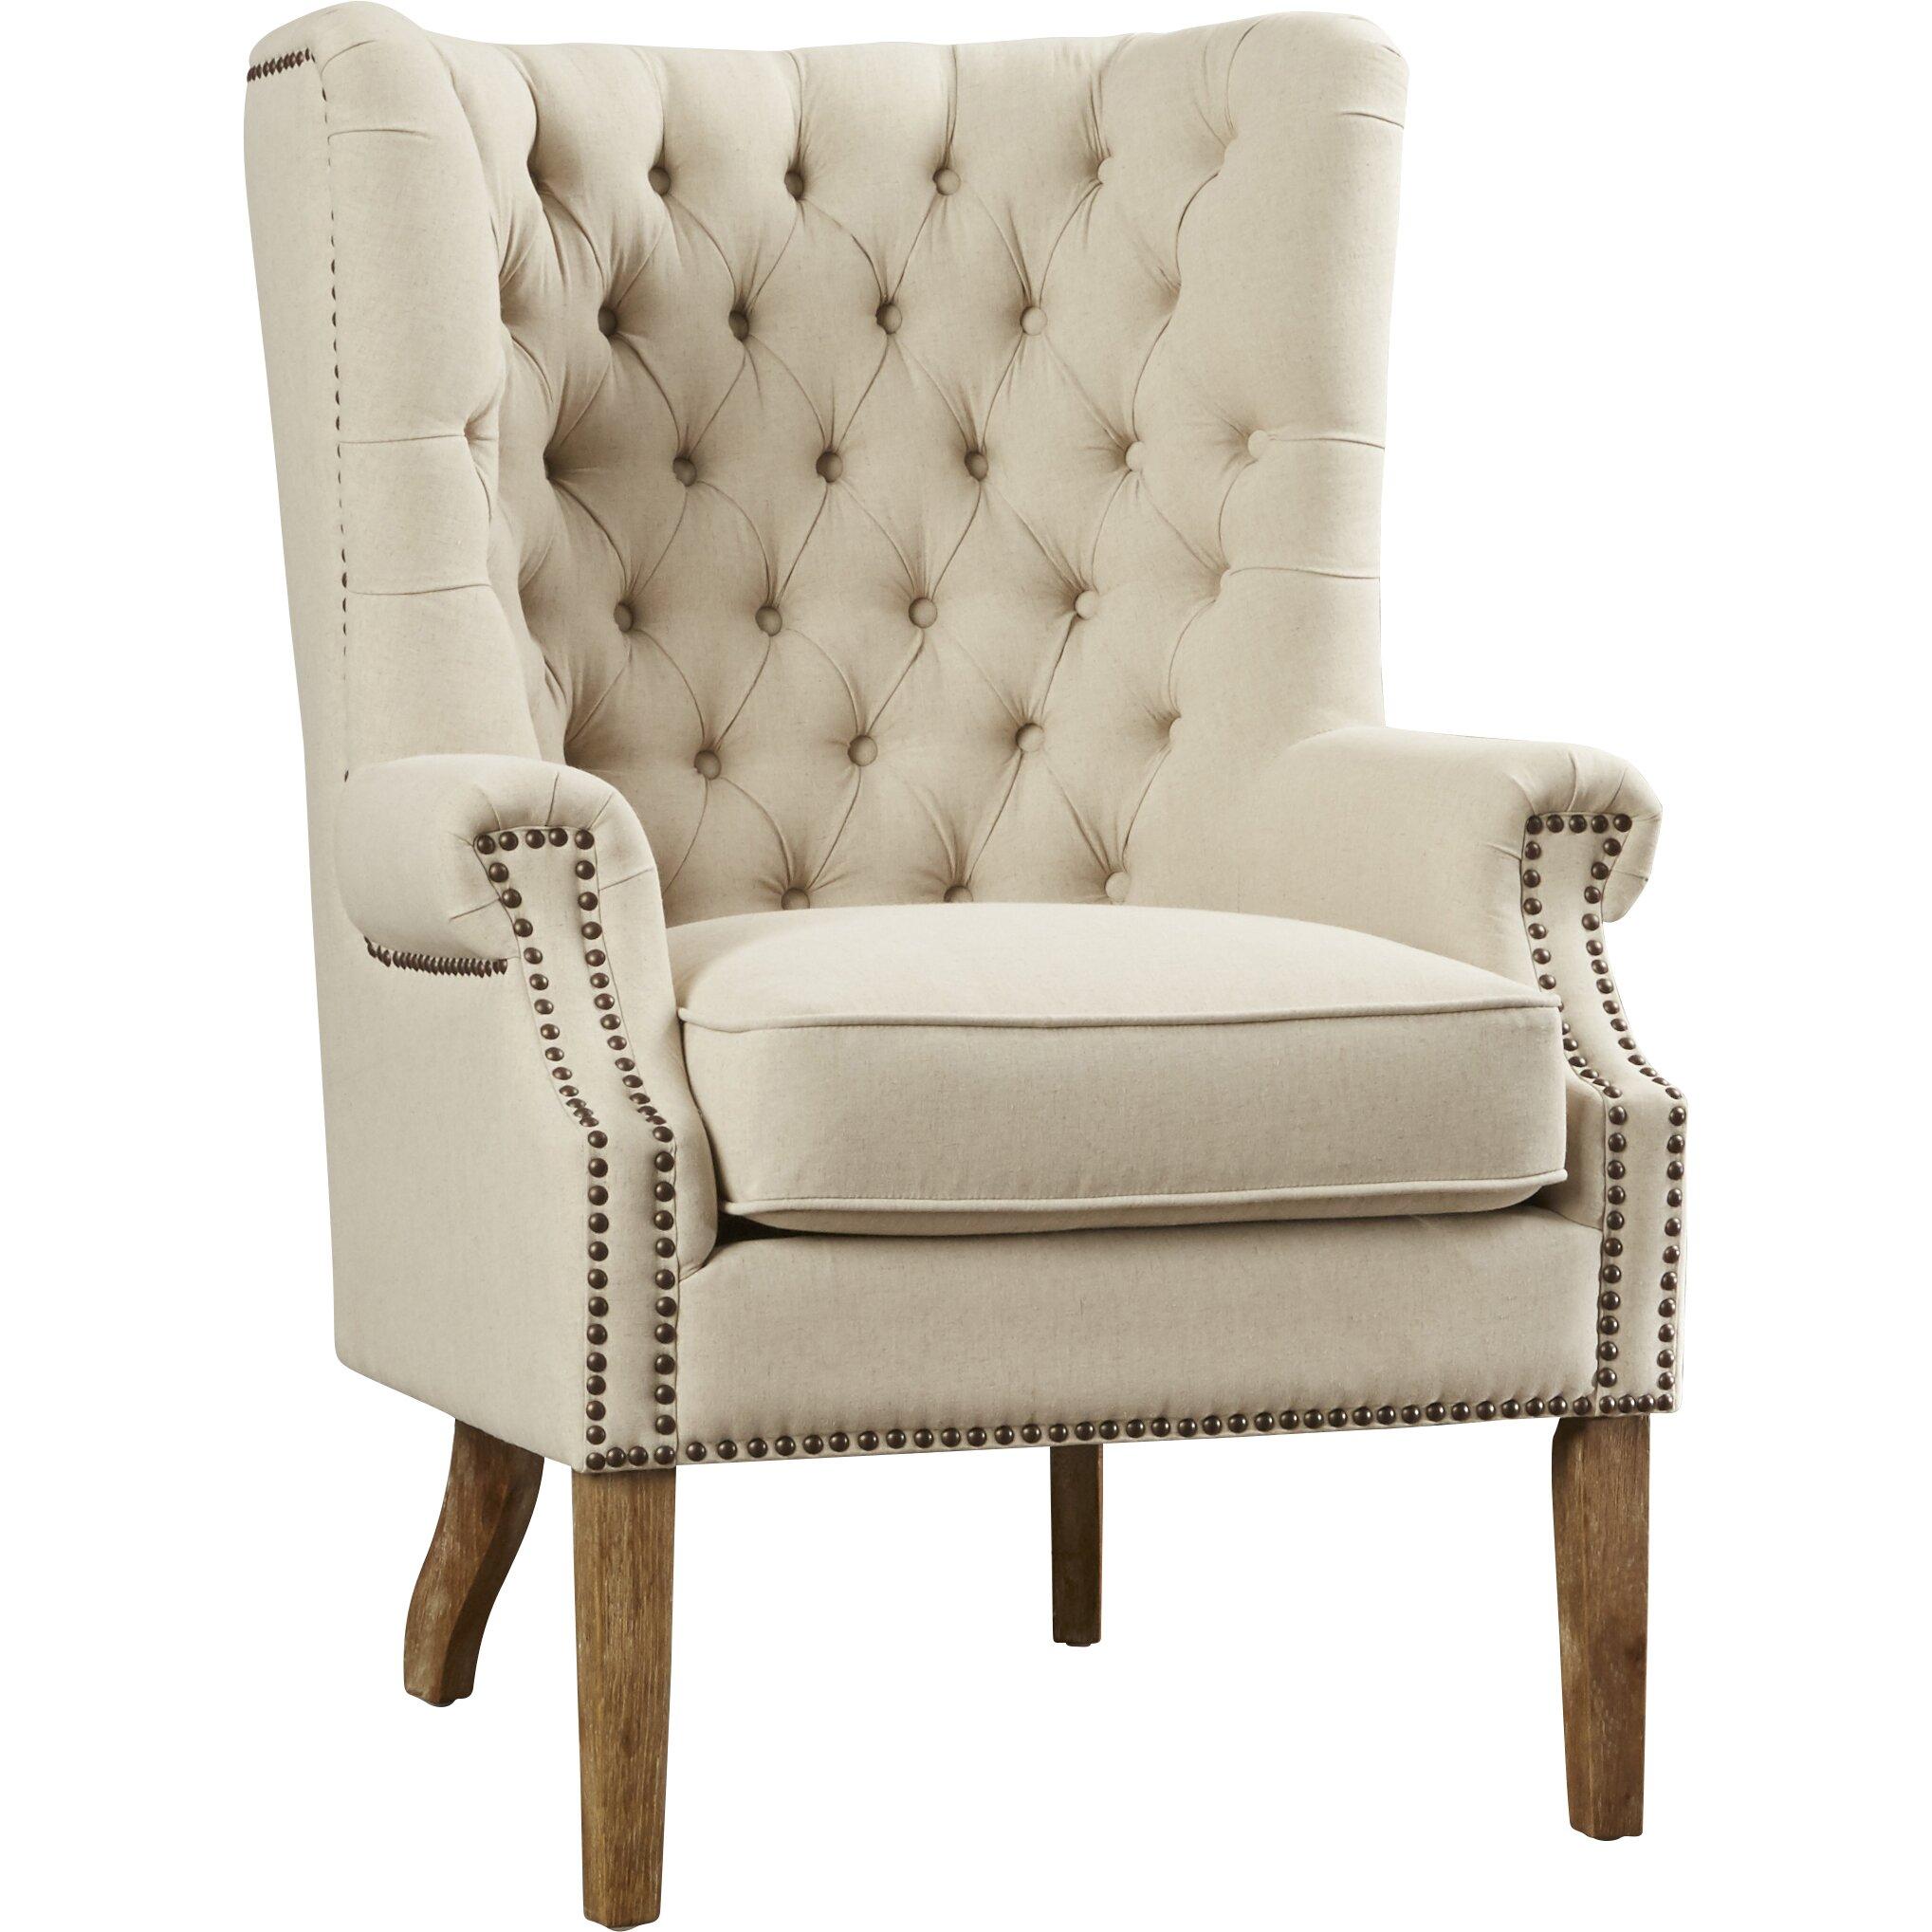 Lark manor lepore wingback arm chair amp reviews wayfair